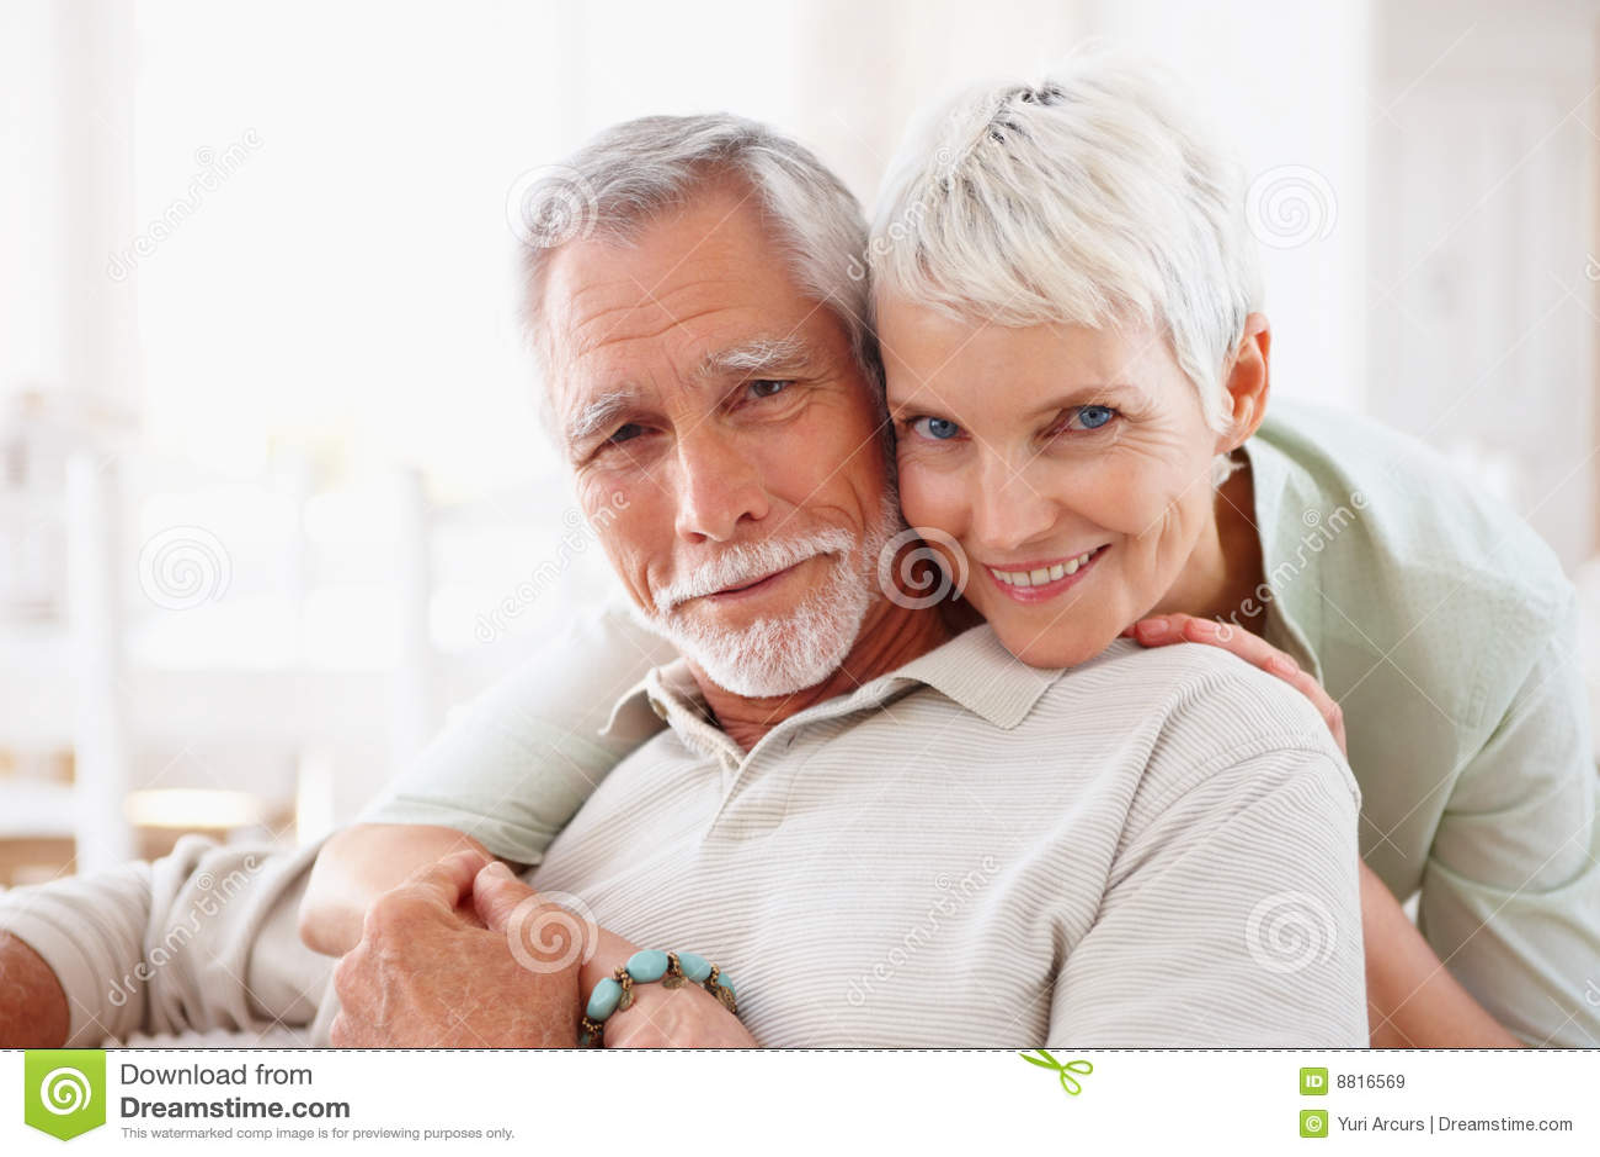 Семейная пара обмен онлайн 23 фотография